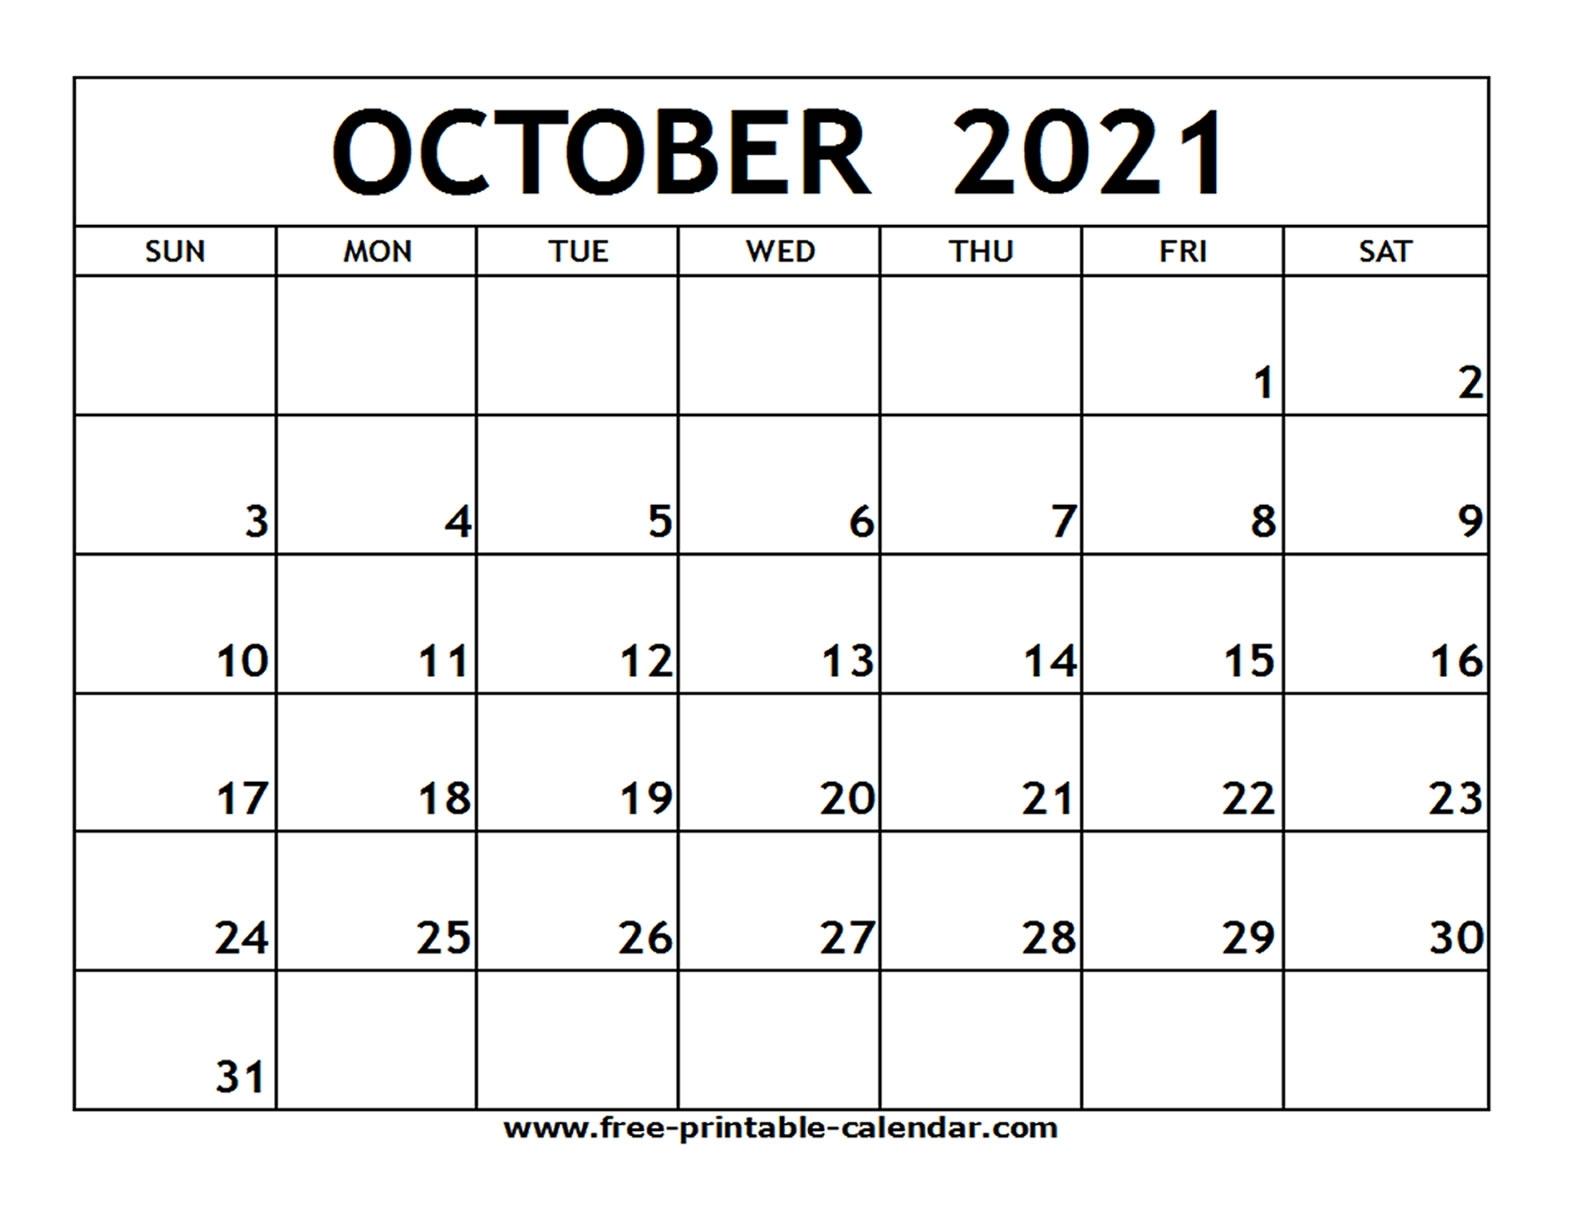 October Calendar 2021 | Month Calendar Printable pertaining to Blank Monthly Calendar 2021